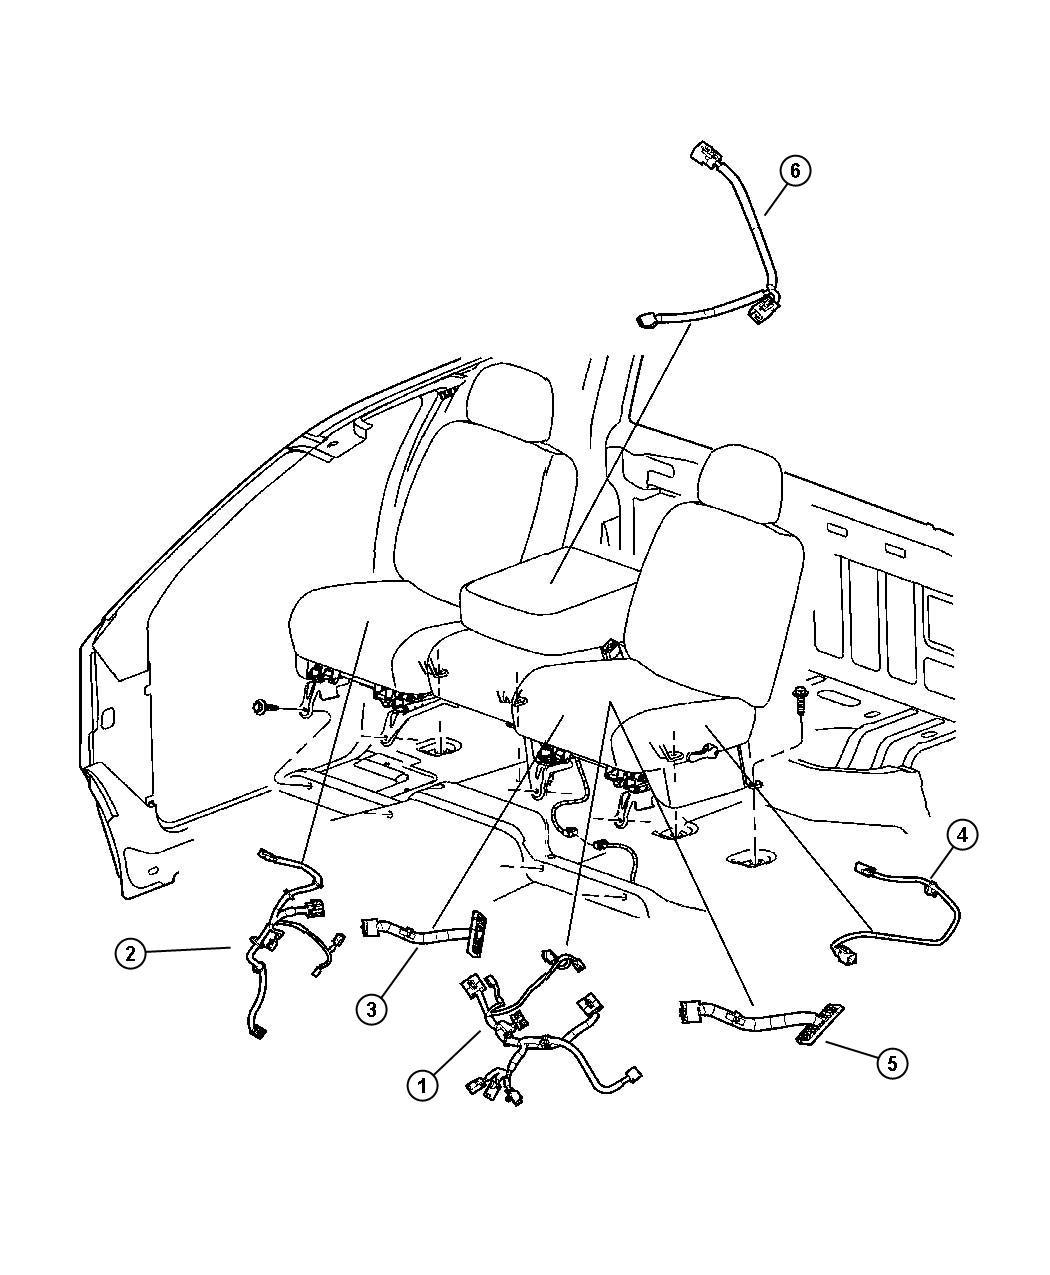 2007 Dodge Ram 3500 Wiring Seats